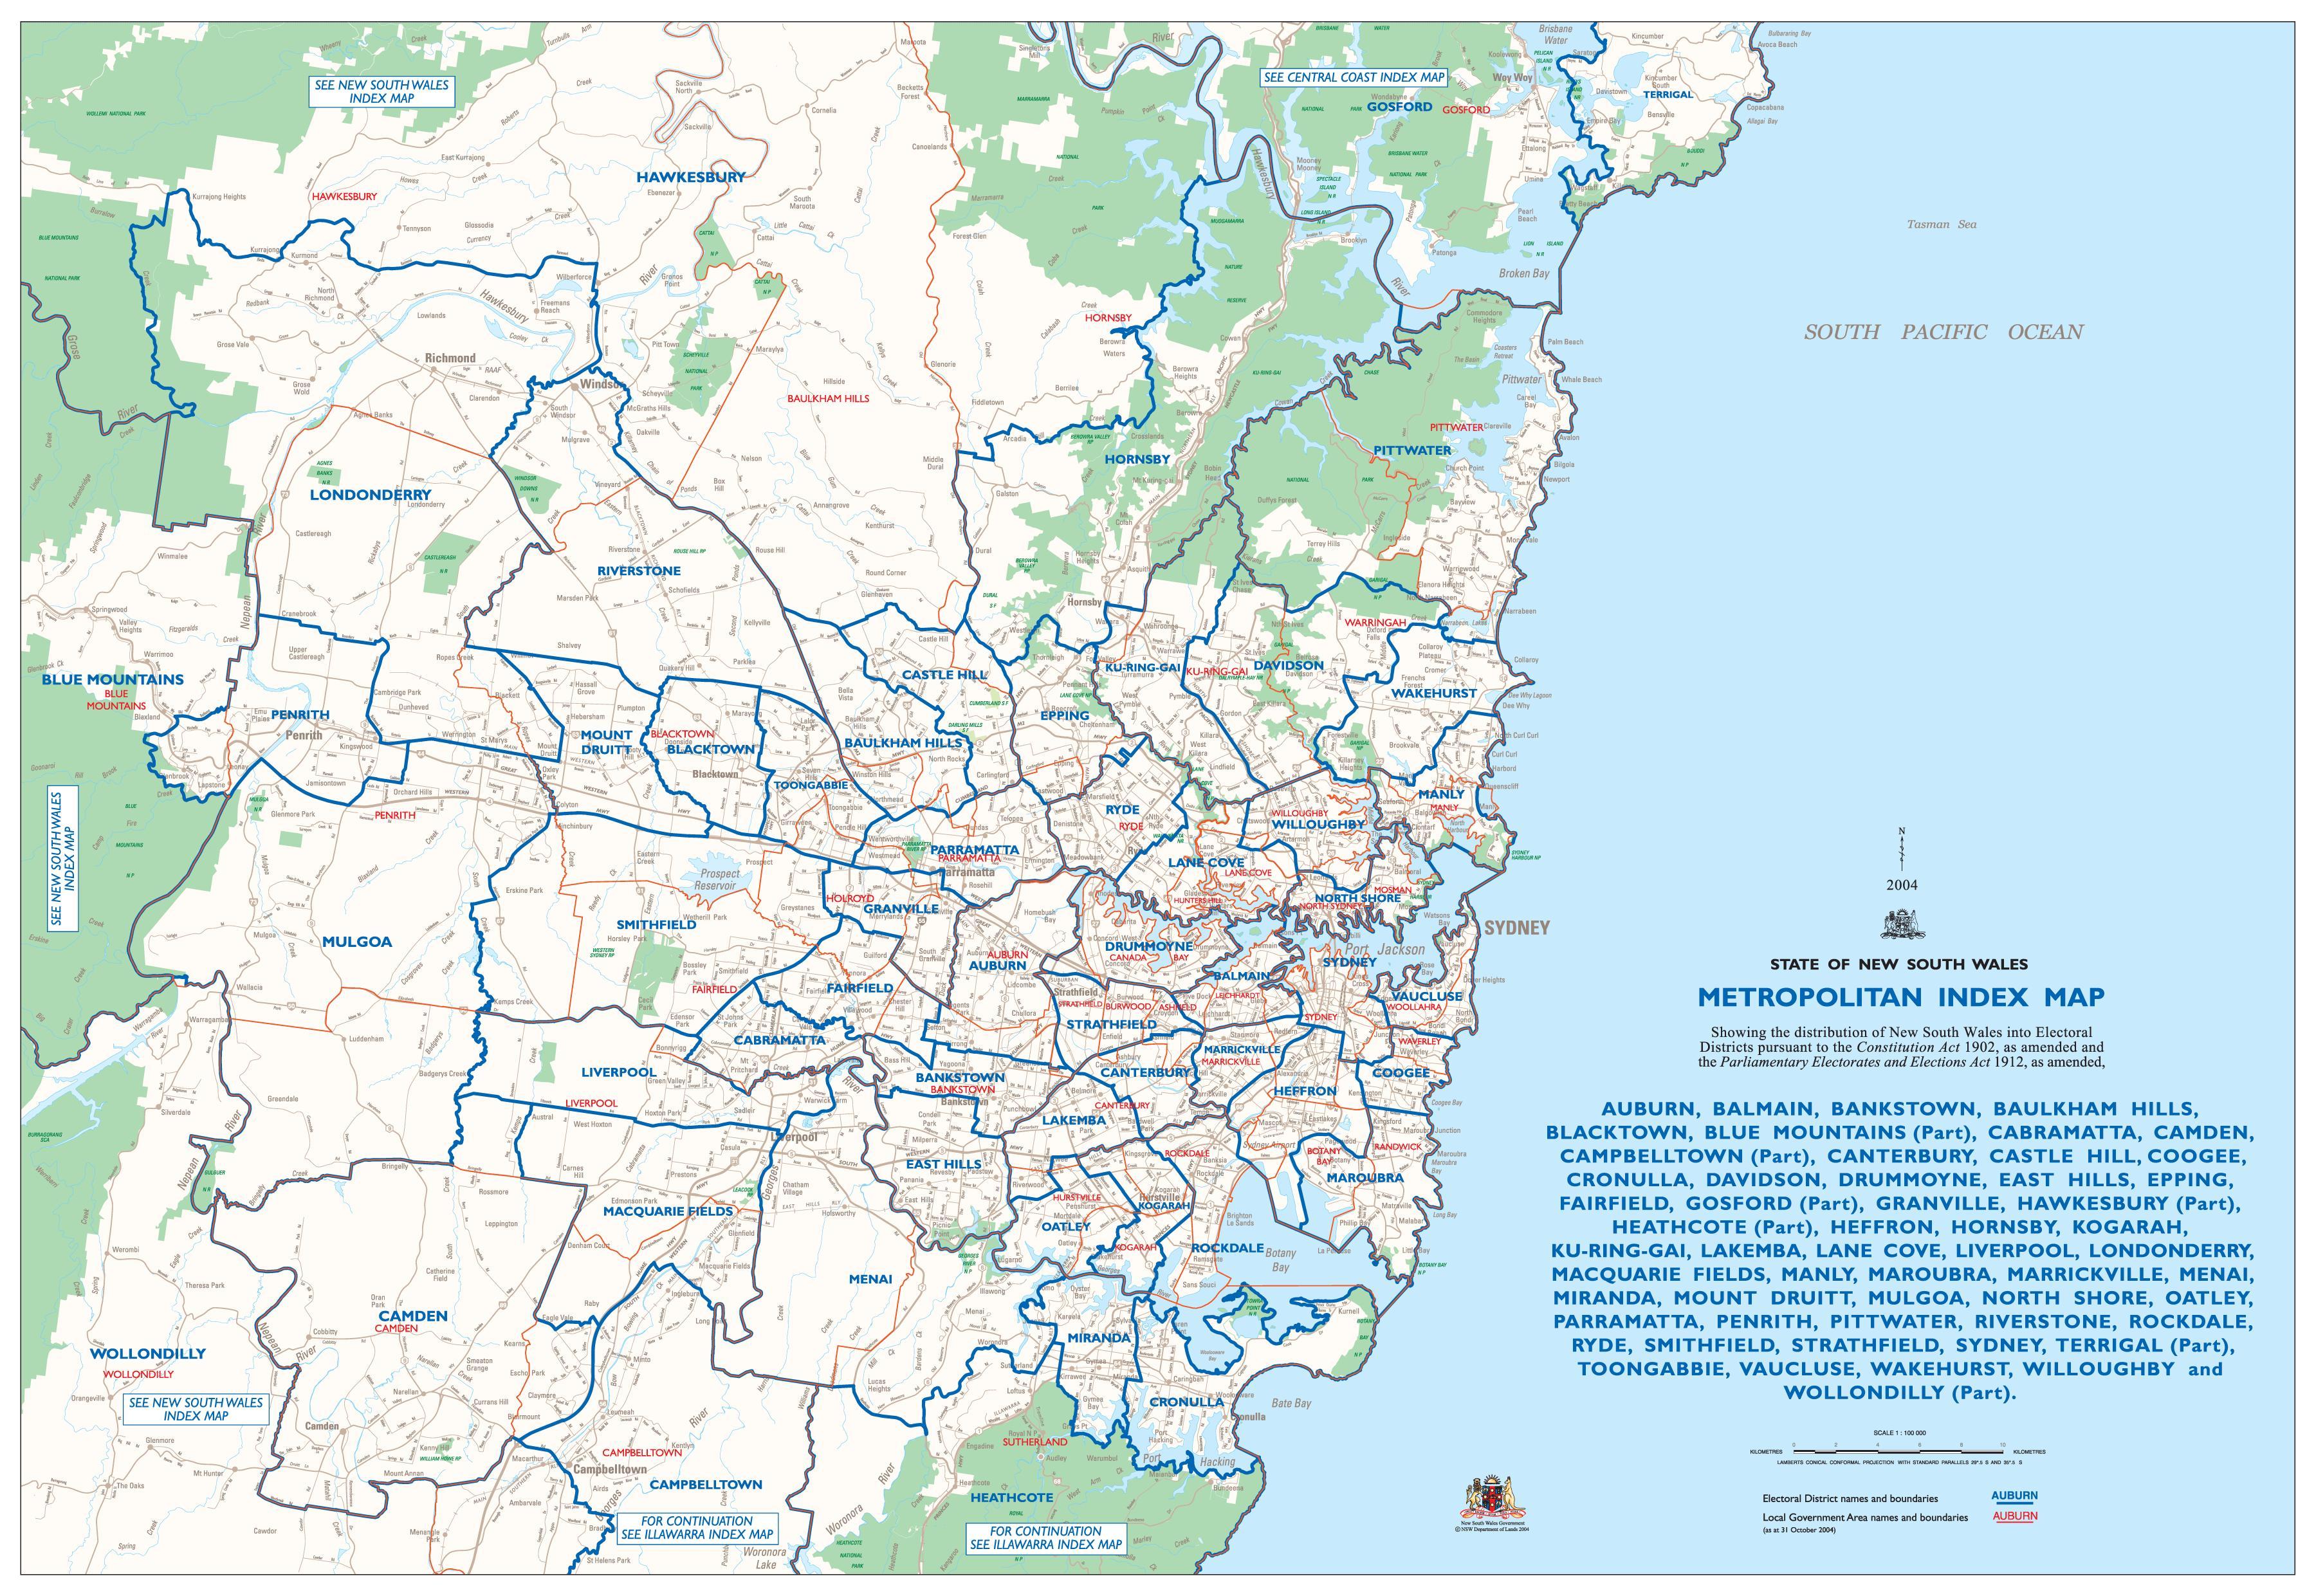 Kartta Sydney Lahiossa Sydney Kartta Lahioissa Australia